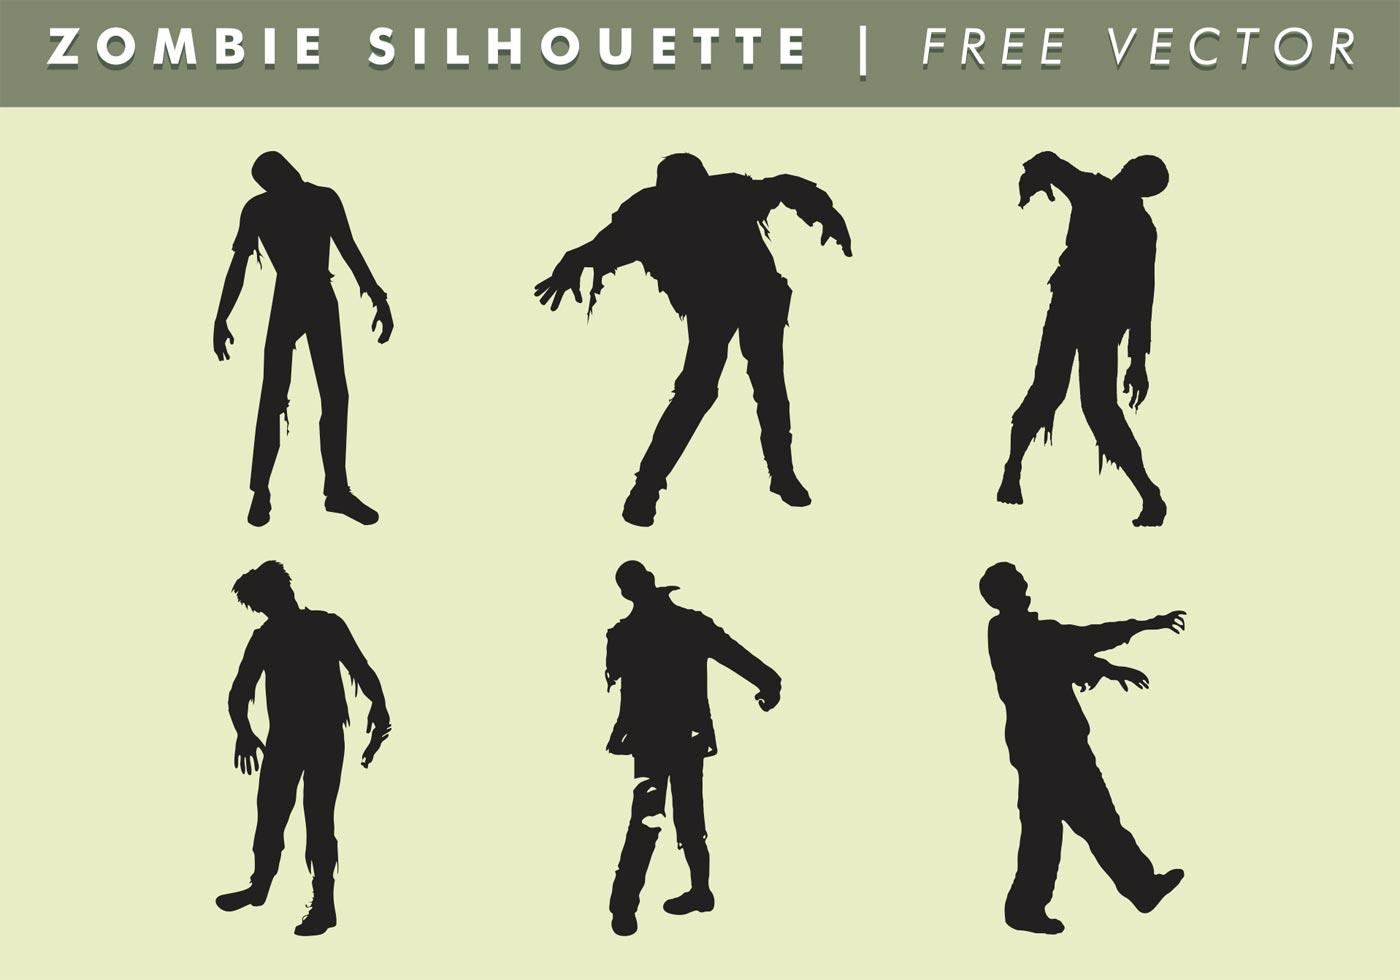 1400x980 Zombie Silhouette Vector Free